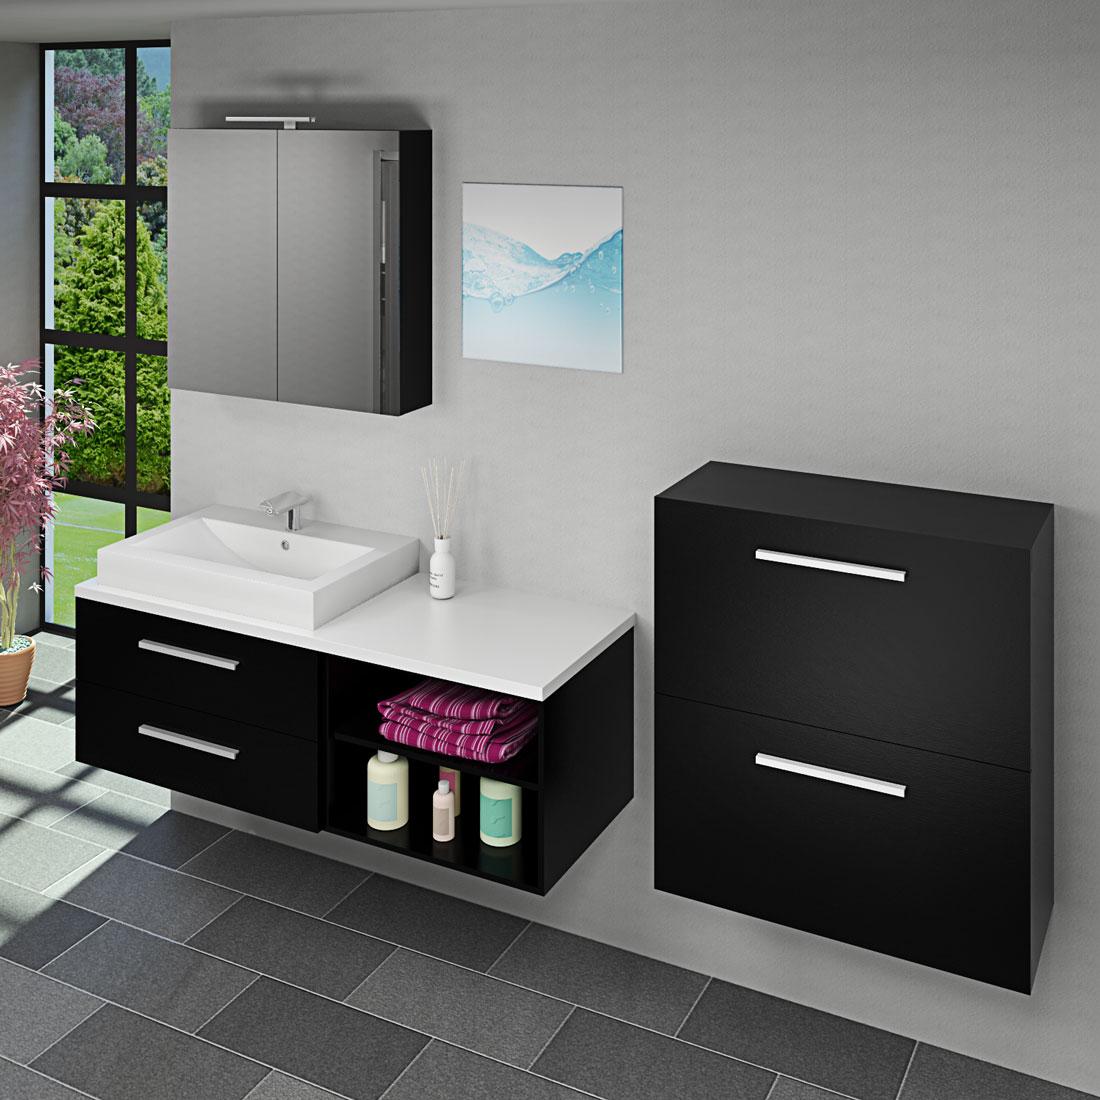 badm bel set city 205 v6 esche schwarz badezimmerm bel waschtisch 140cm. Black Bedroom Furniture Sets. Home Design Ideas